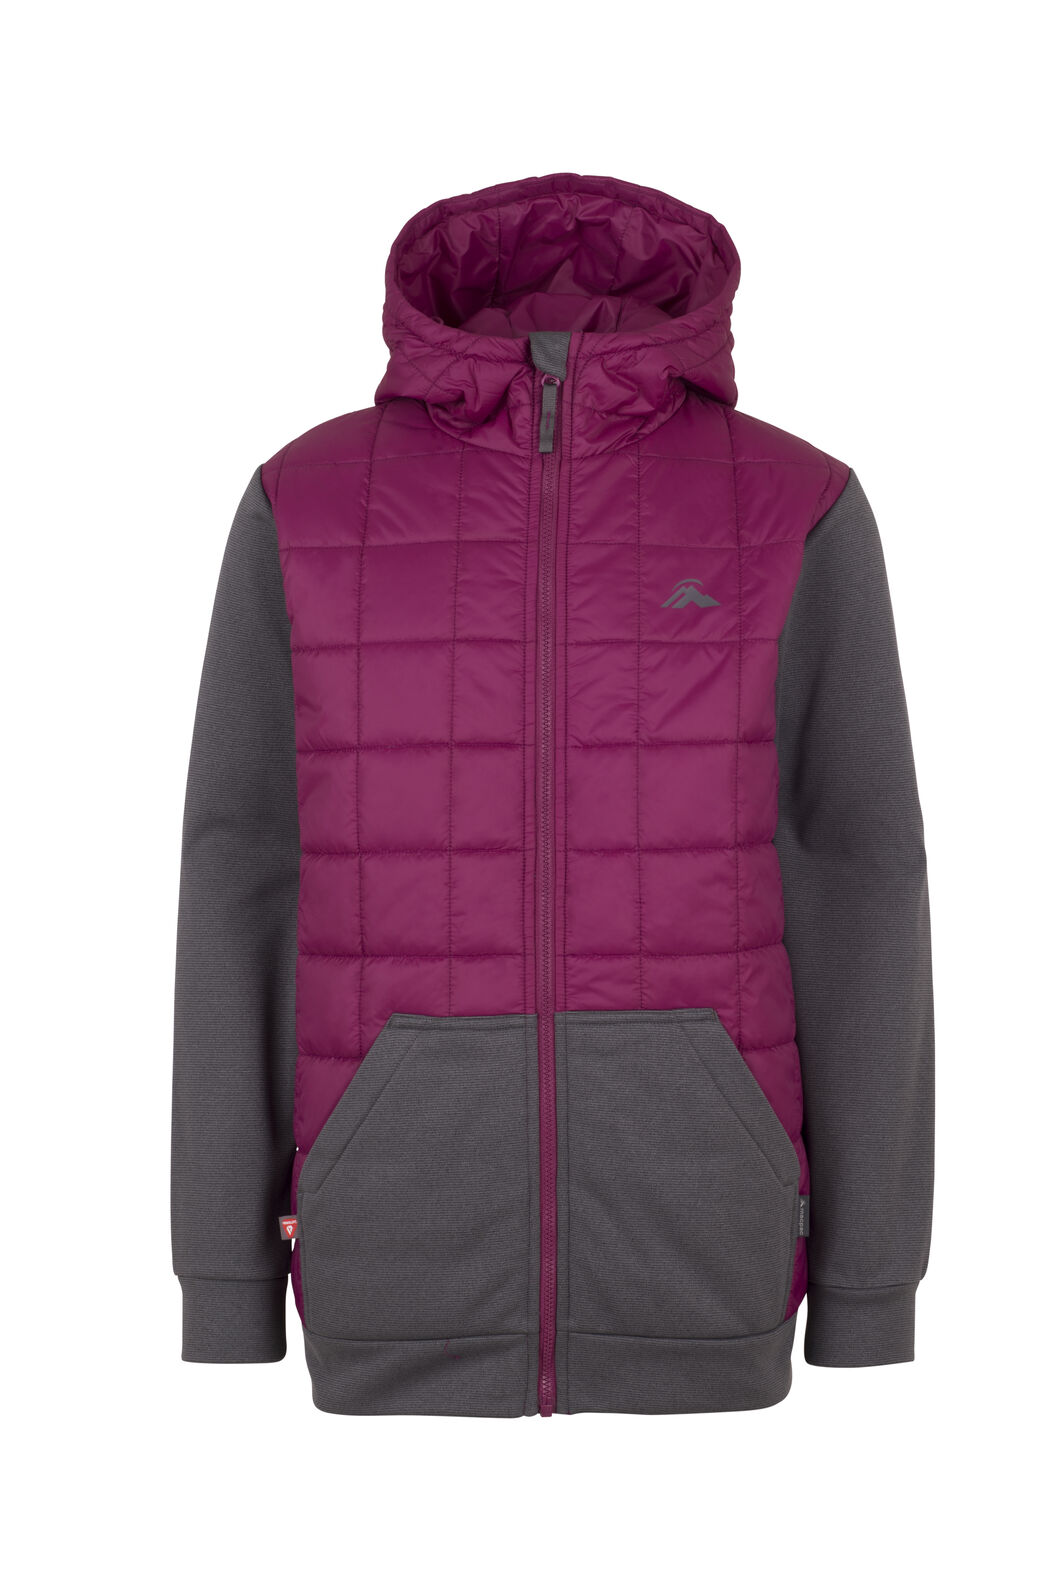 Macpac Campfire PrimaLoft® Hybrid Jacket - Kids', Magenta/Asphalt, hi-res